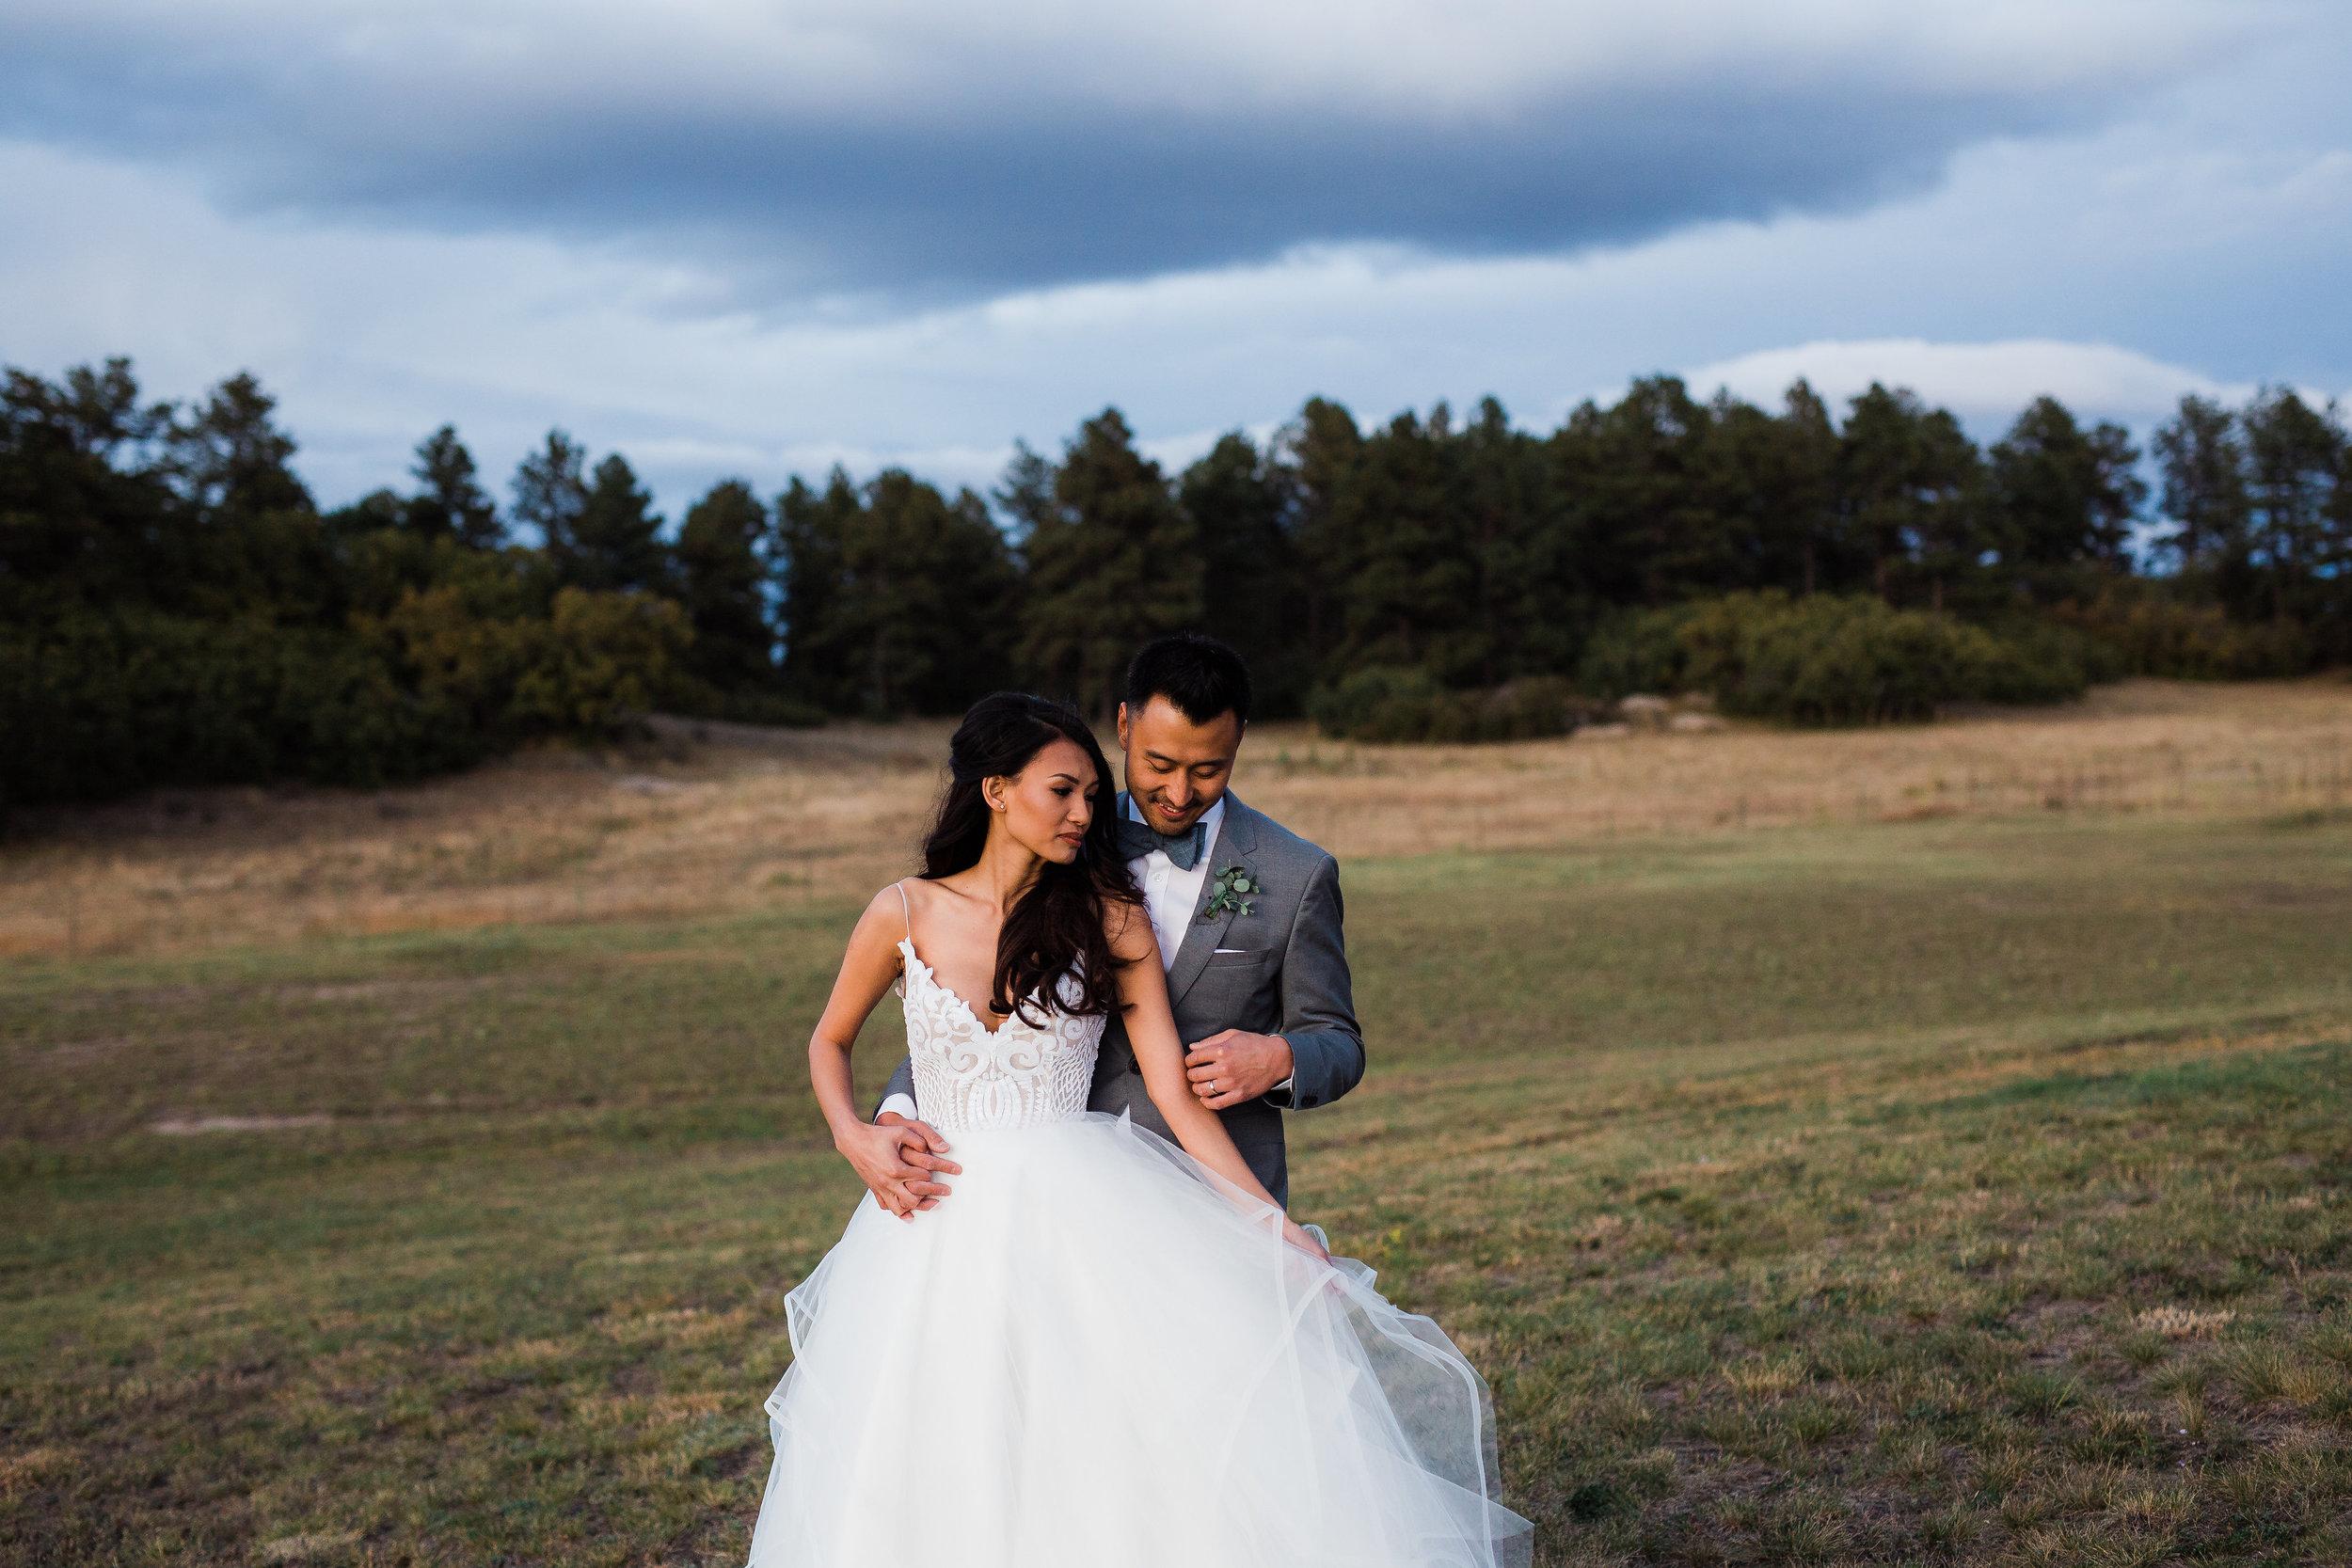 Adventure wedding photographers in Colorado Springs